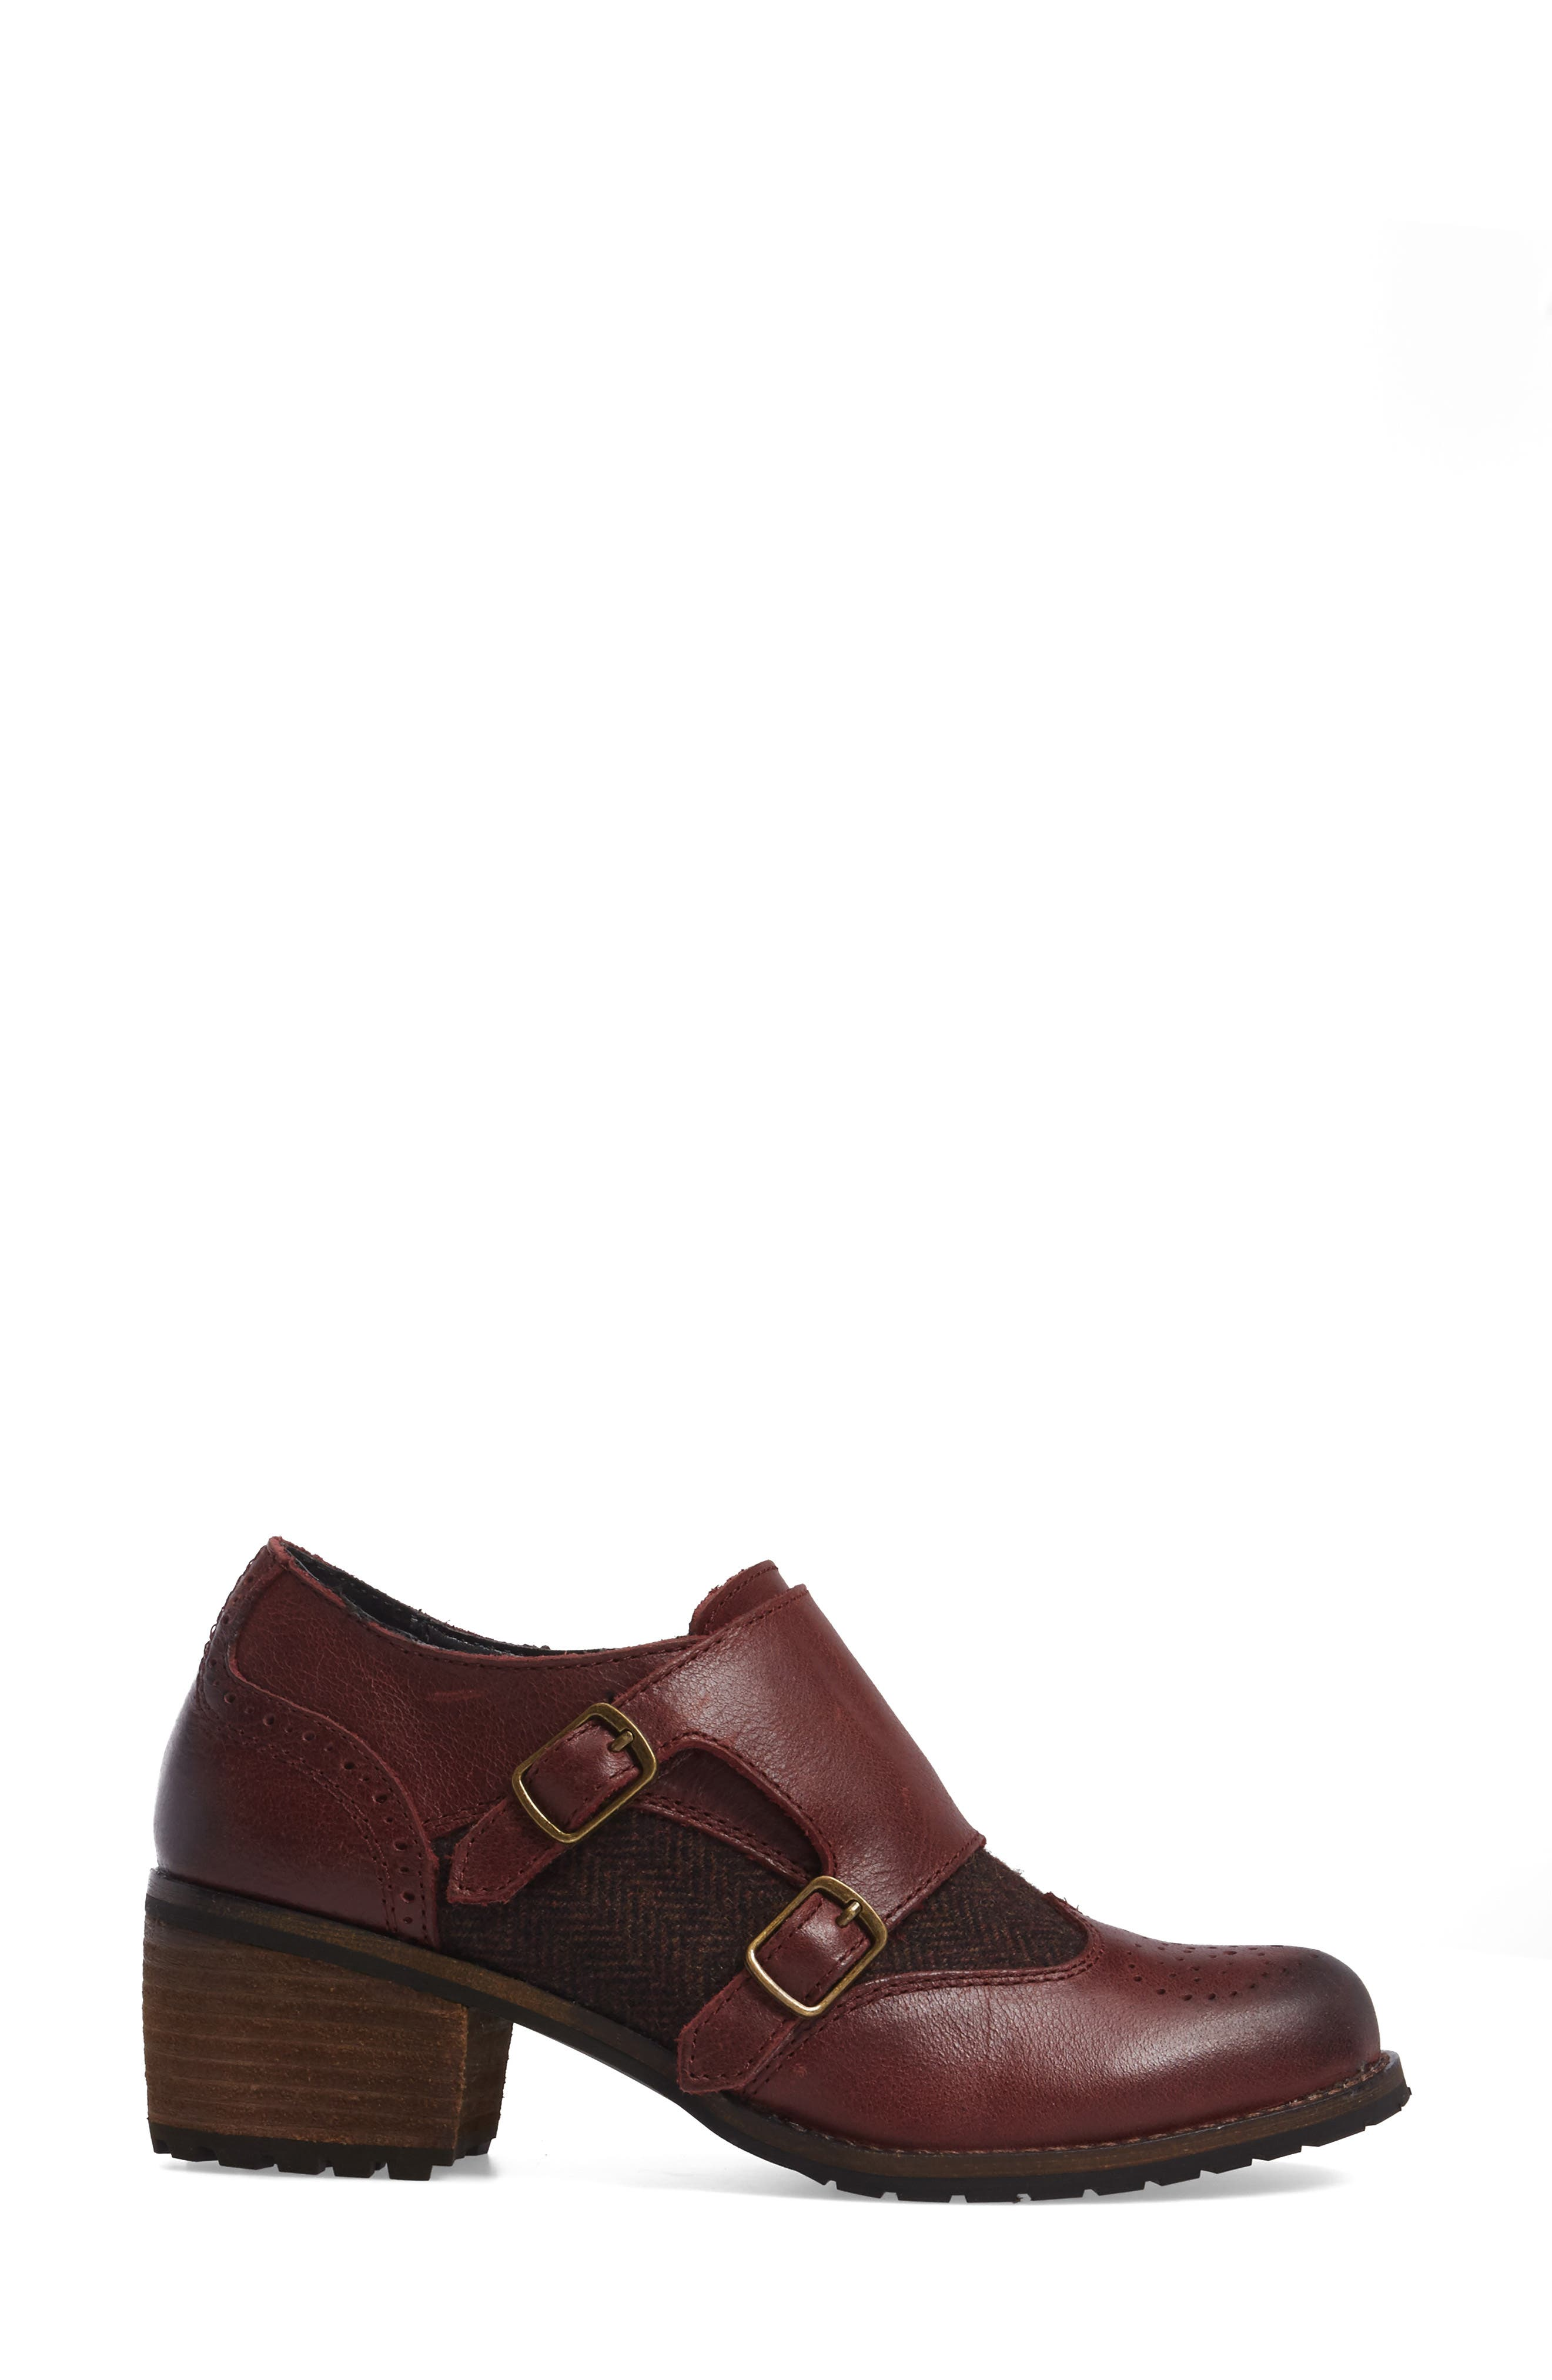 Dina Double Monk Strap Ankle Boot,                             Alternate thumbnail 3, color,                             Merlot Leather